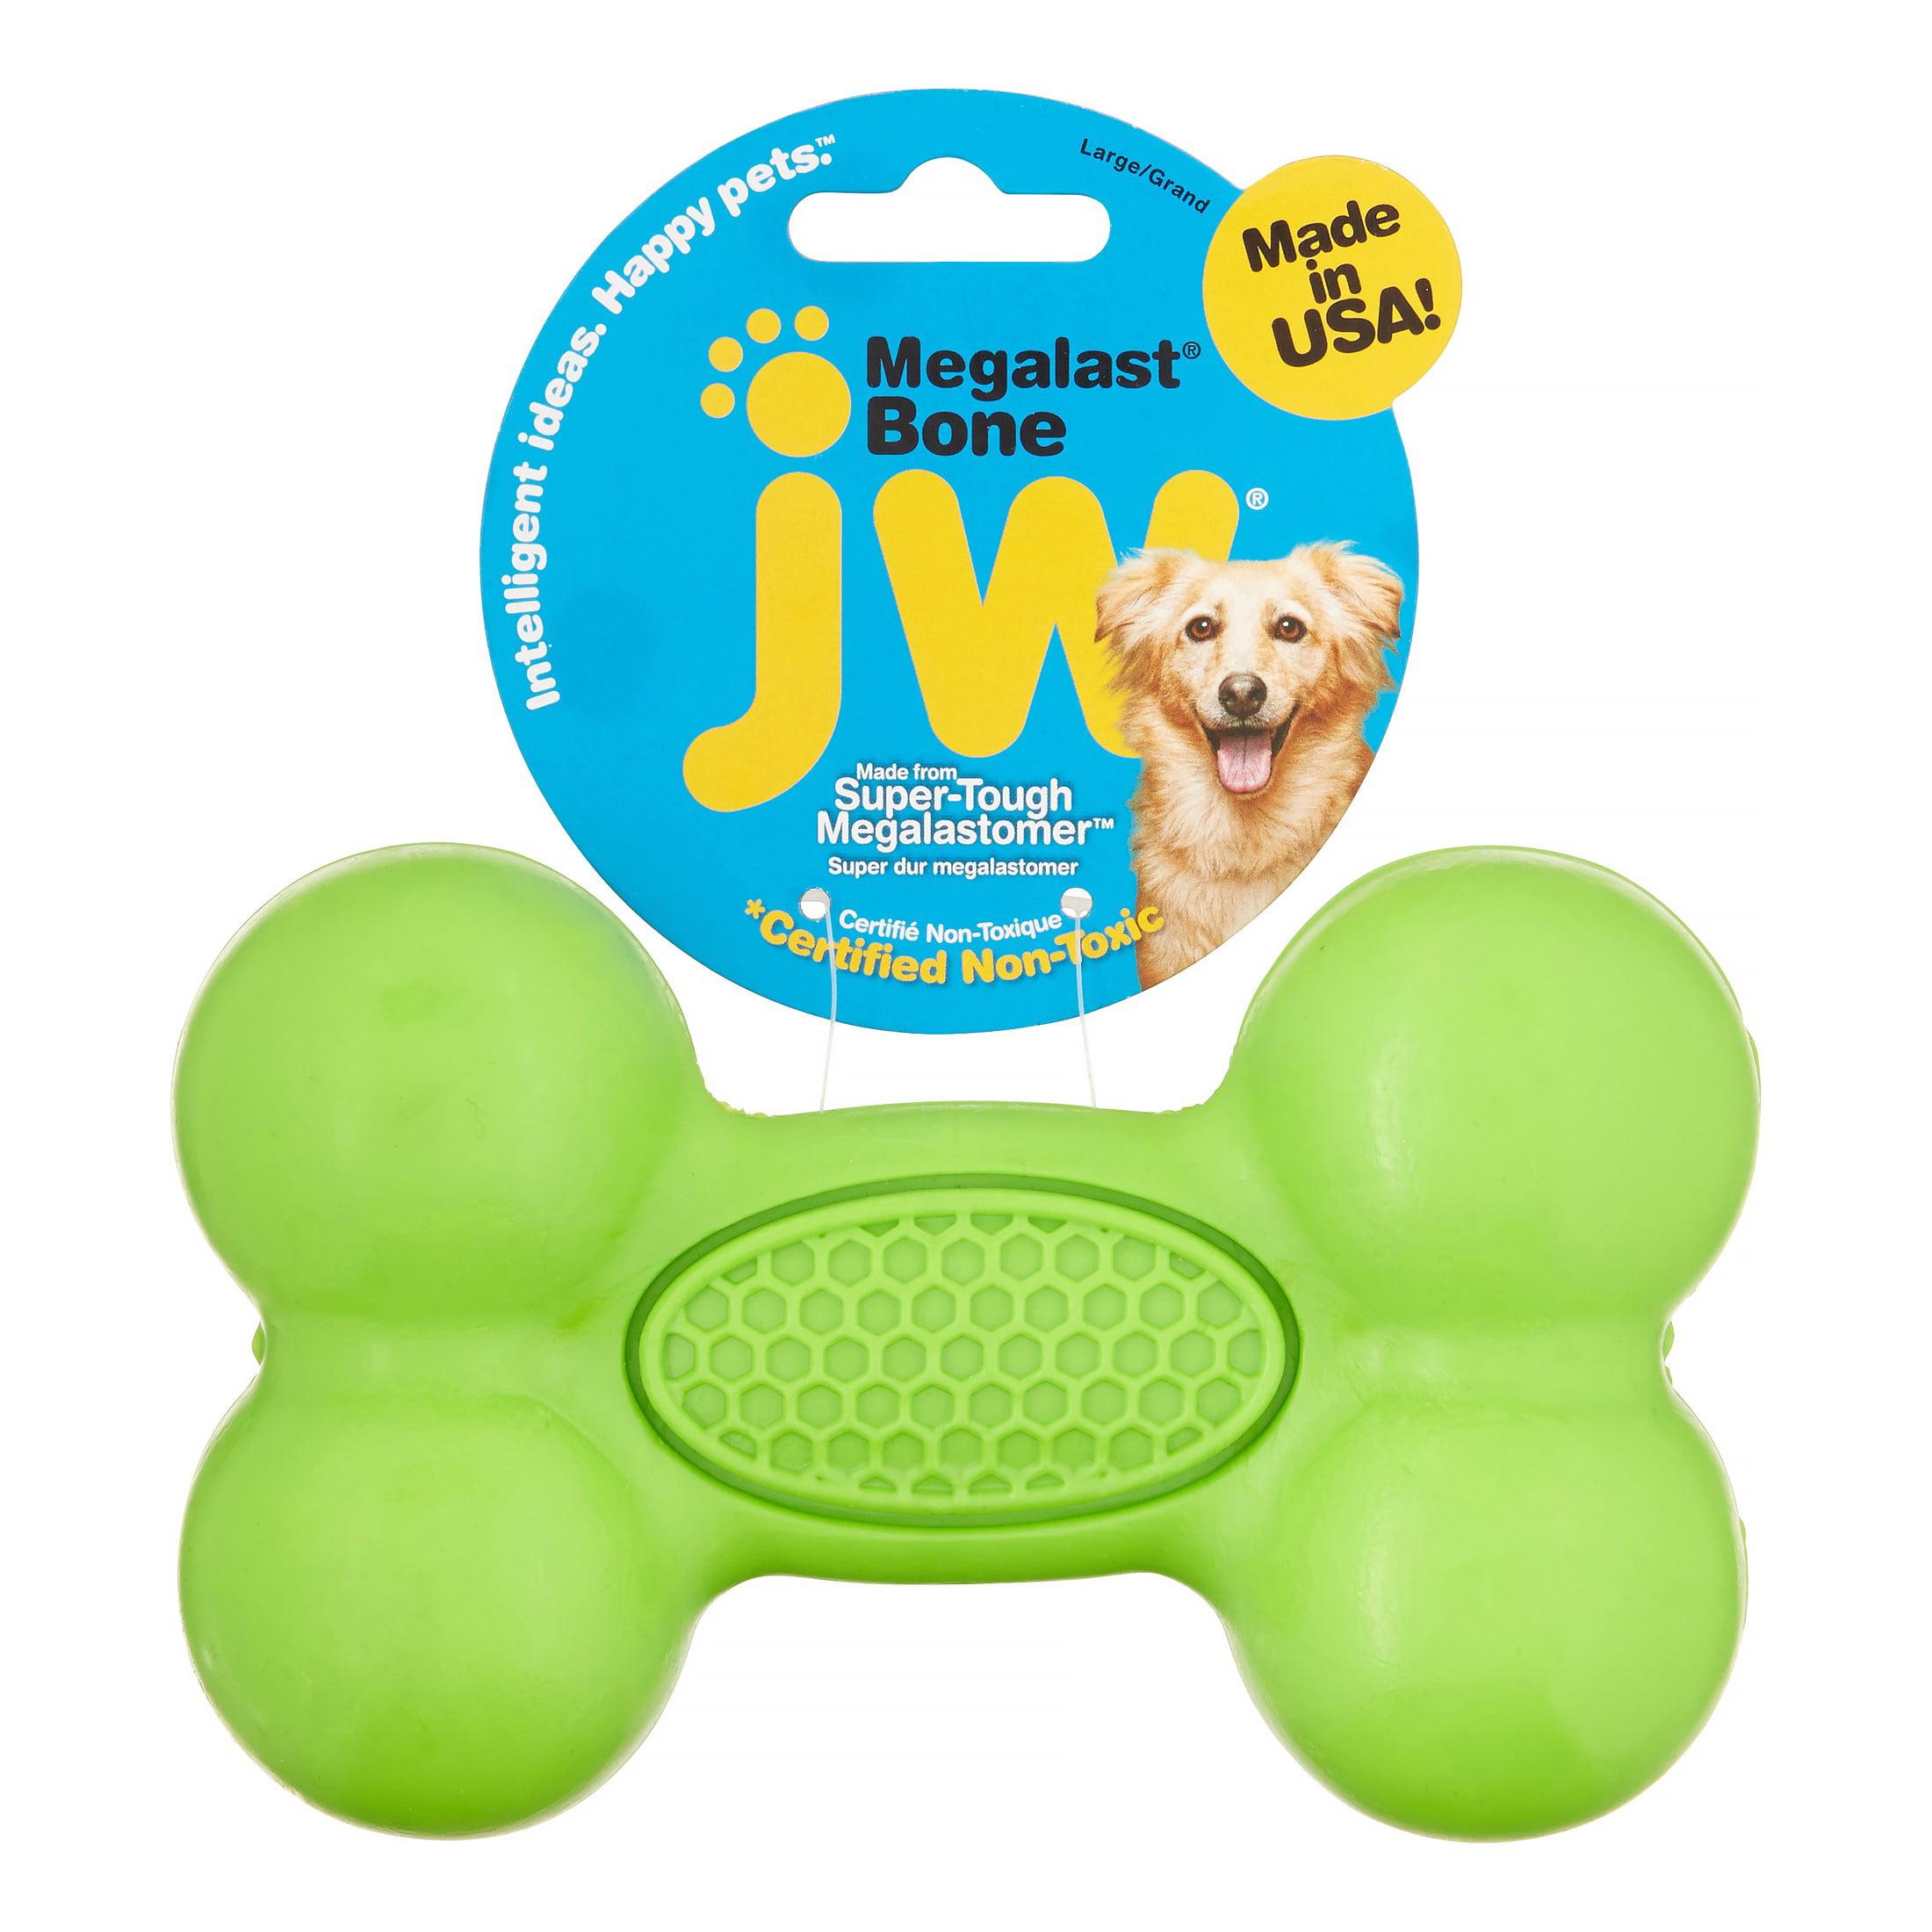 Petmate JW MegaLast Bone Dog Toy, Large, Assorted Colors